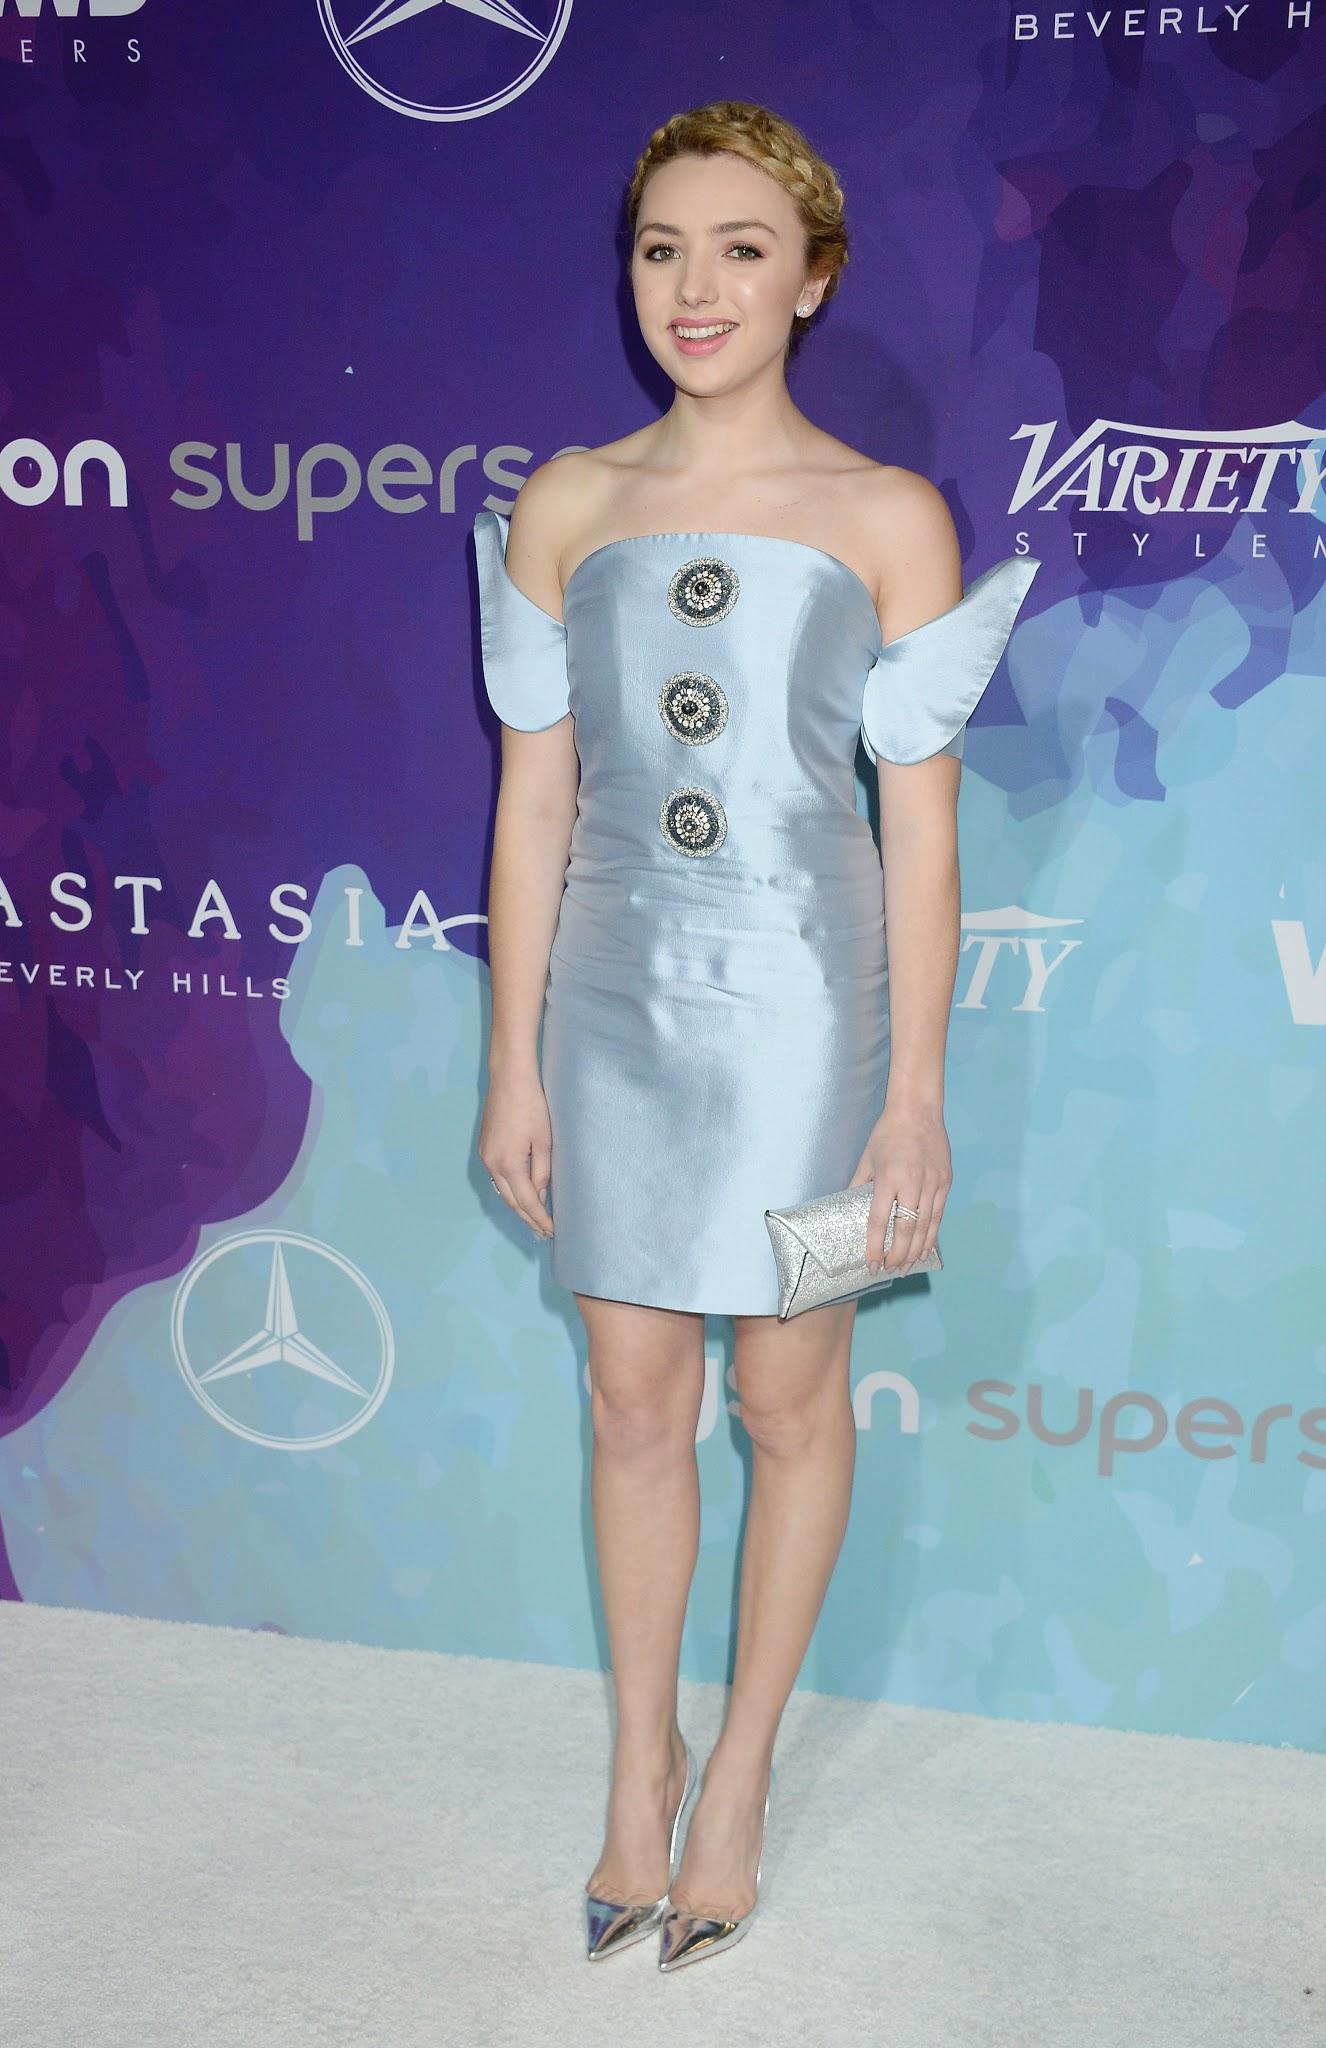 The Toe Cleavage Blog: Women of TV - Peyton List